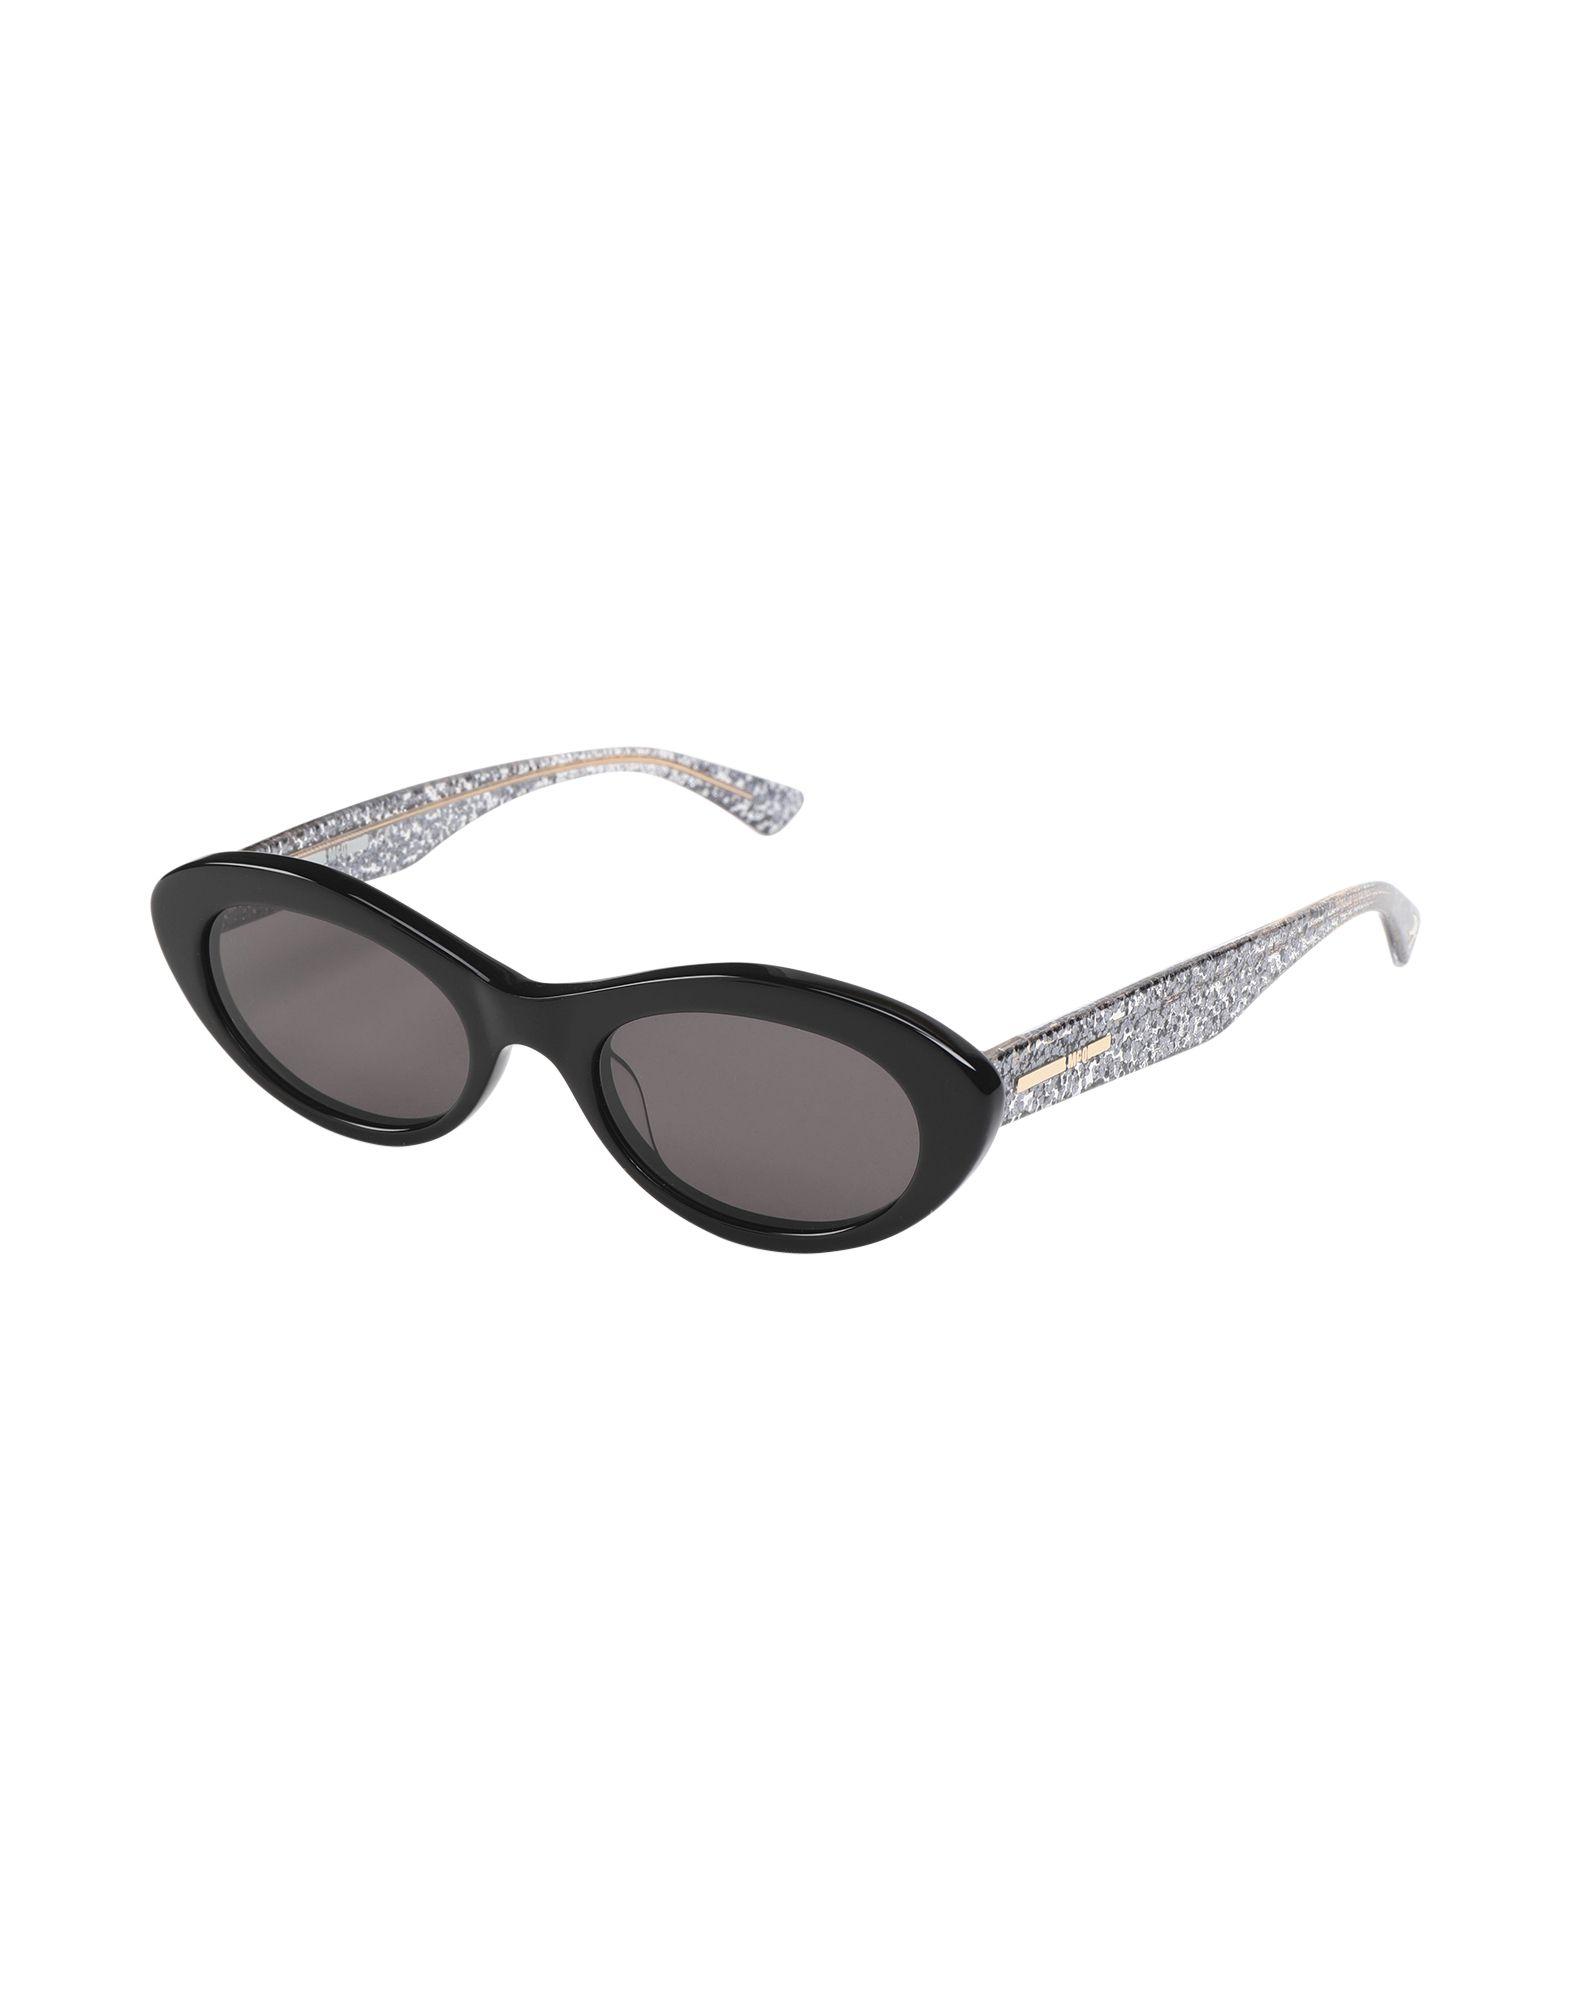 McQ Alexander McQueen Солнечные очки